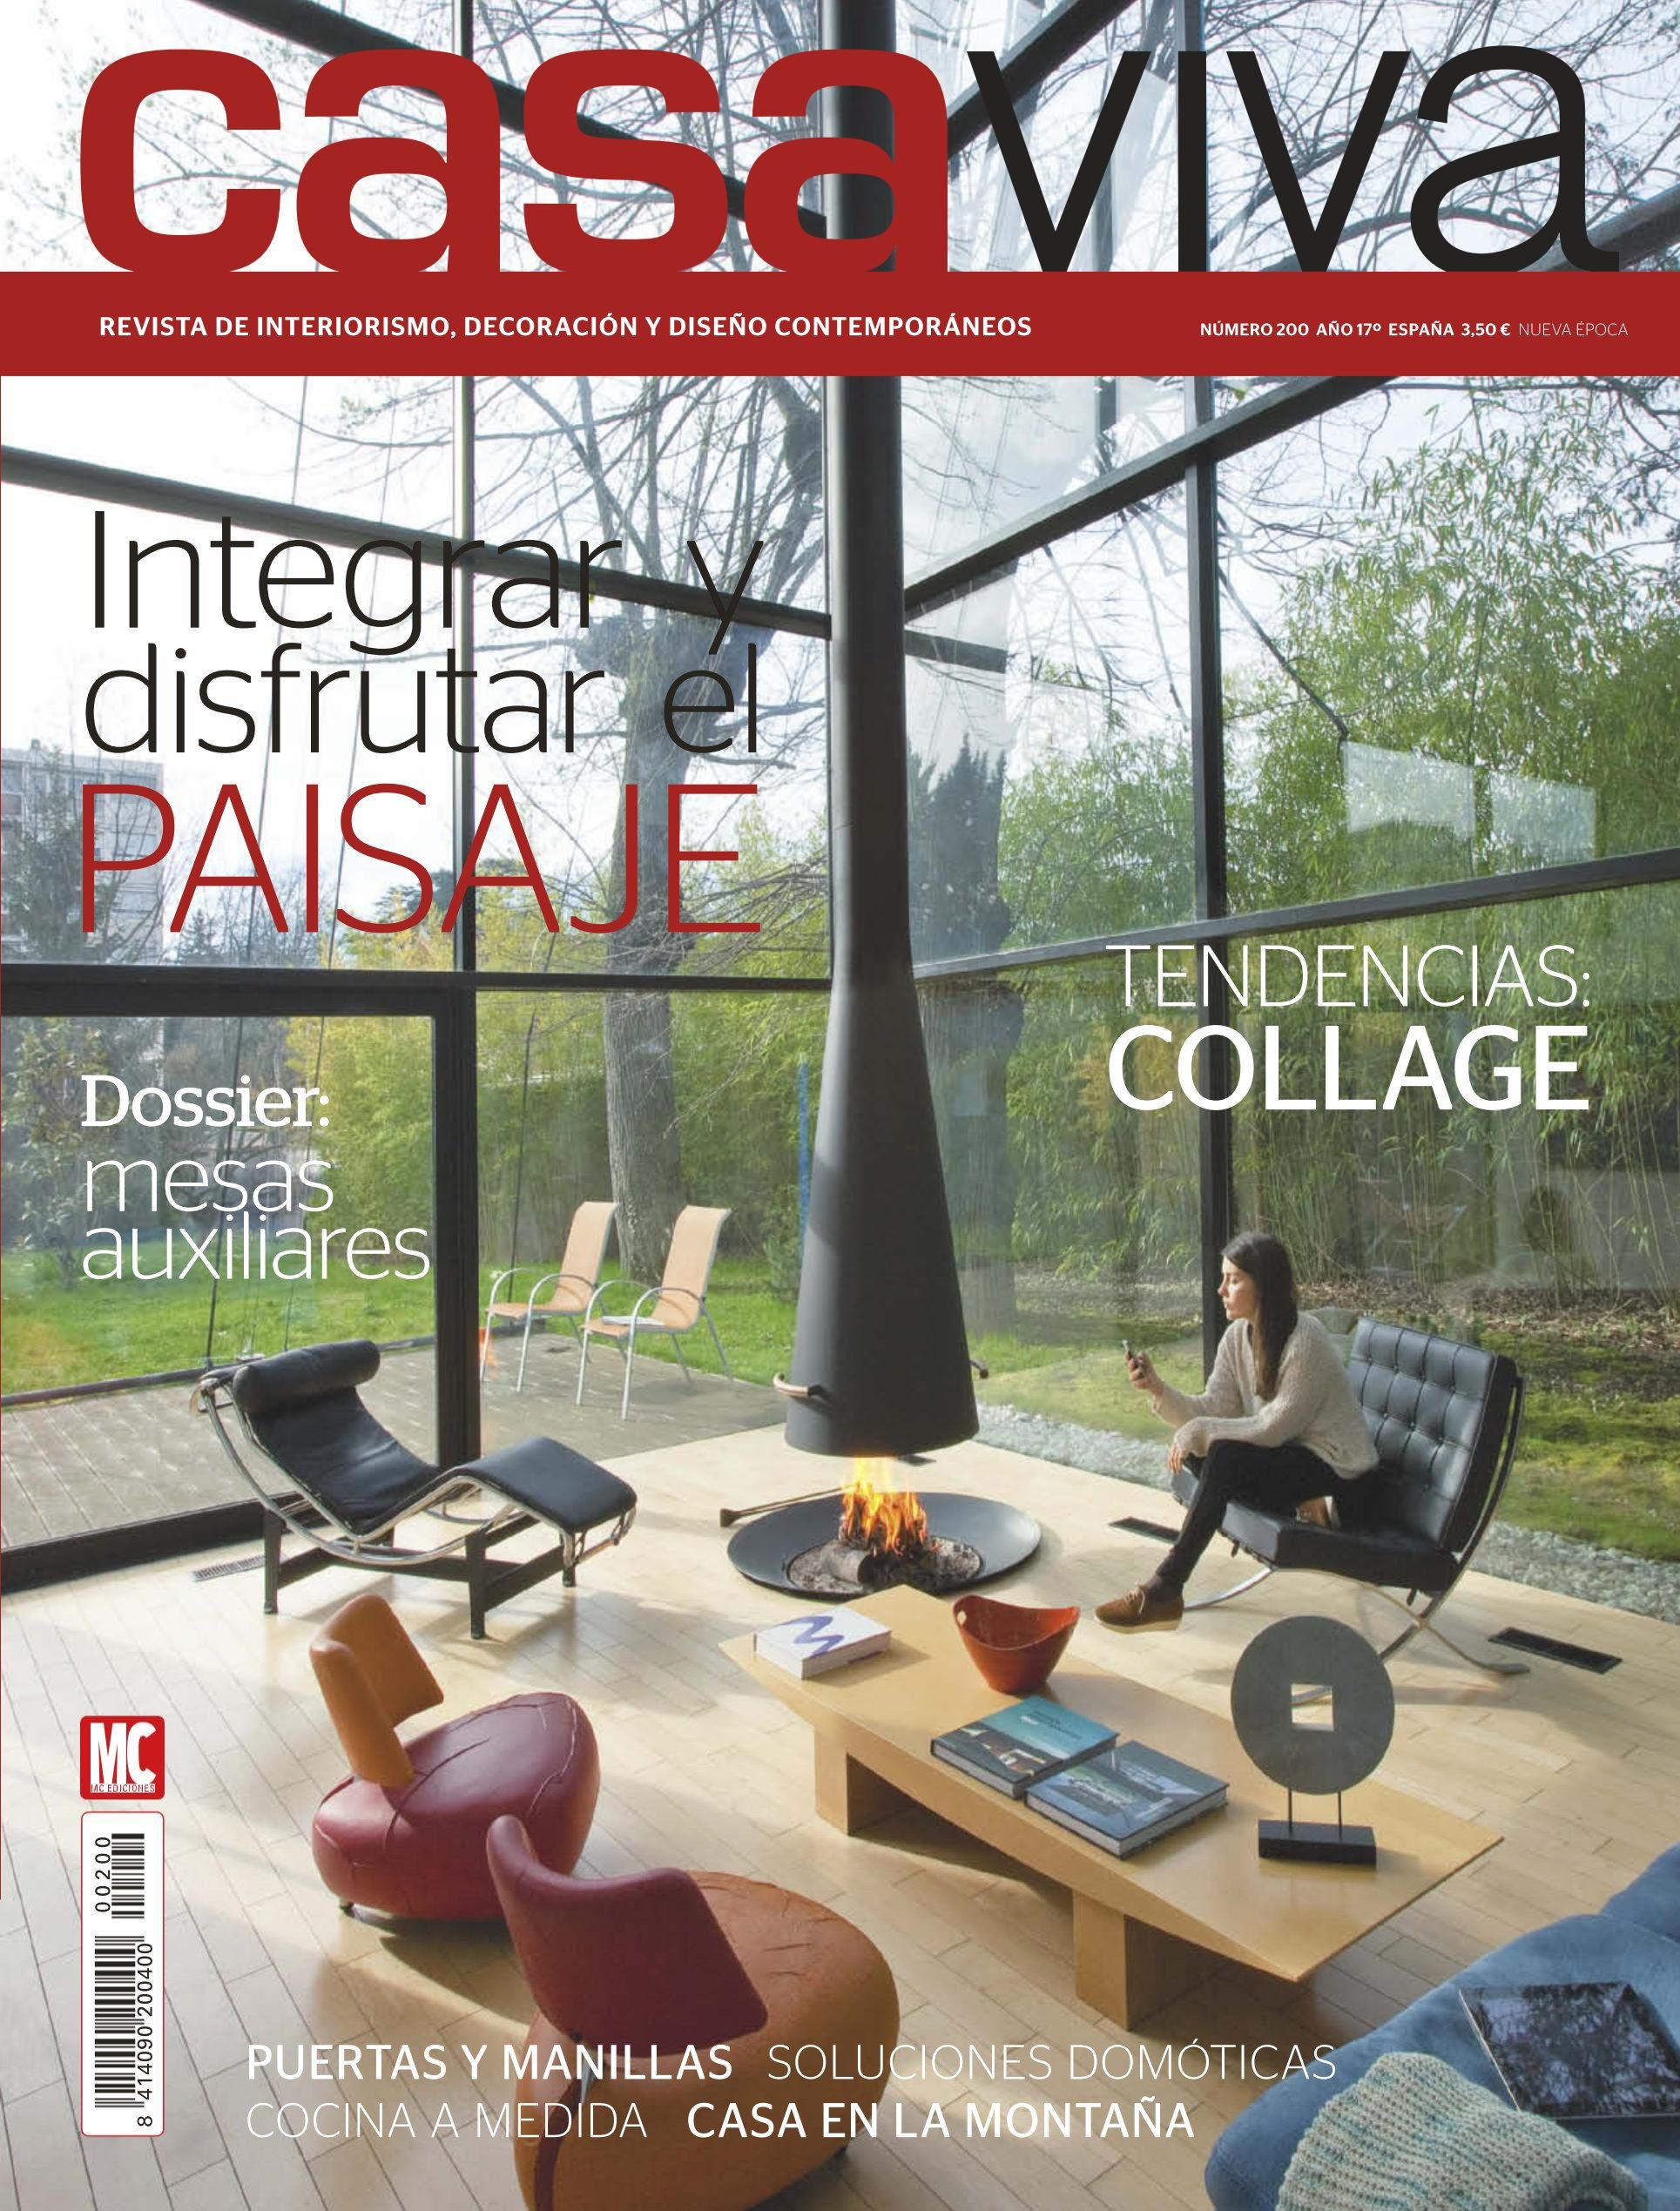 Pin en Revistas de decoración e ideas para el hogar